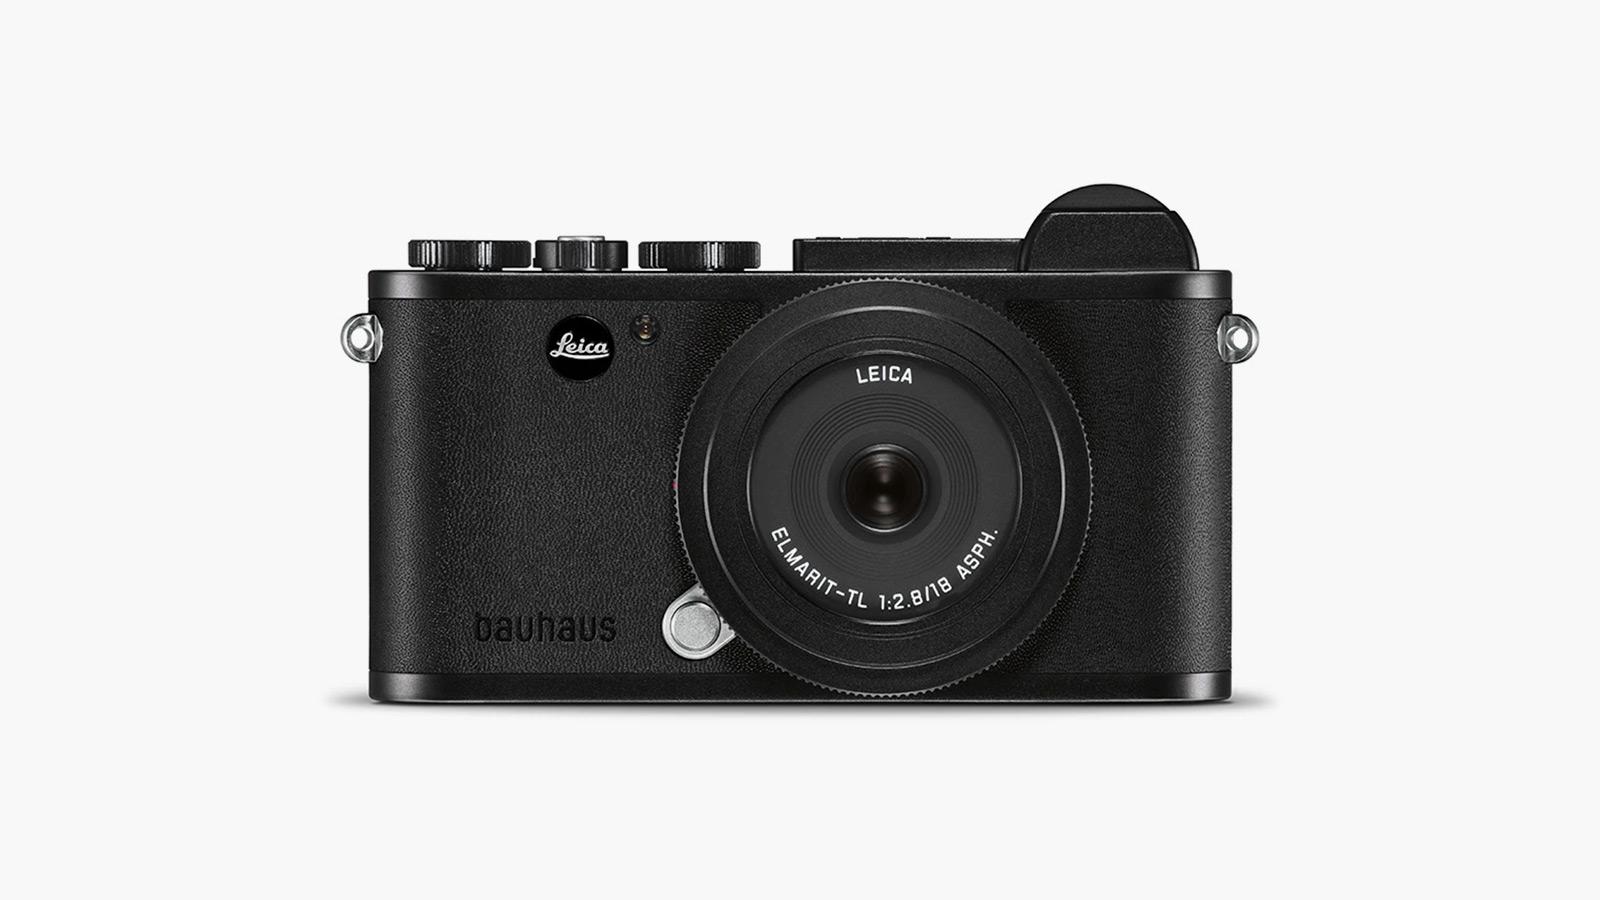 Leica CL '100 jahre bauhaus' Edition